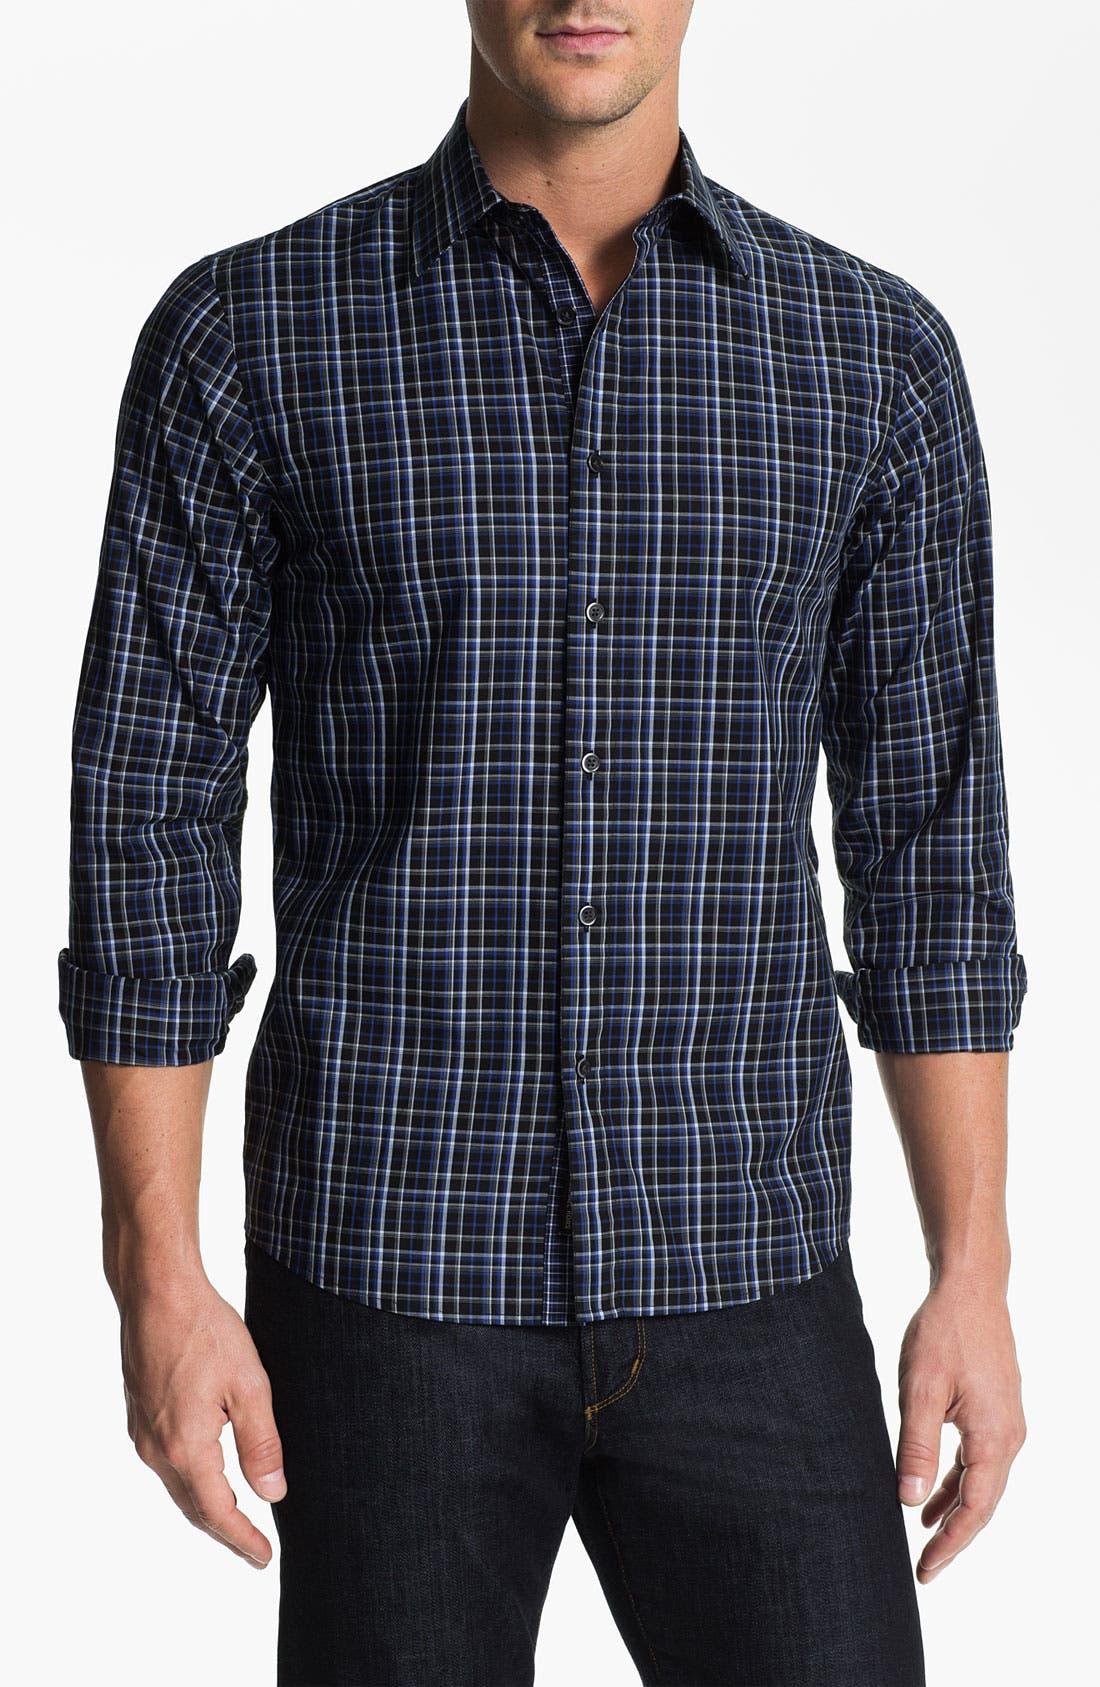 Alternate Image 1 Selected - Michael Kors 'Cyd Check' Sport Shirt